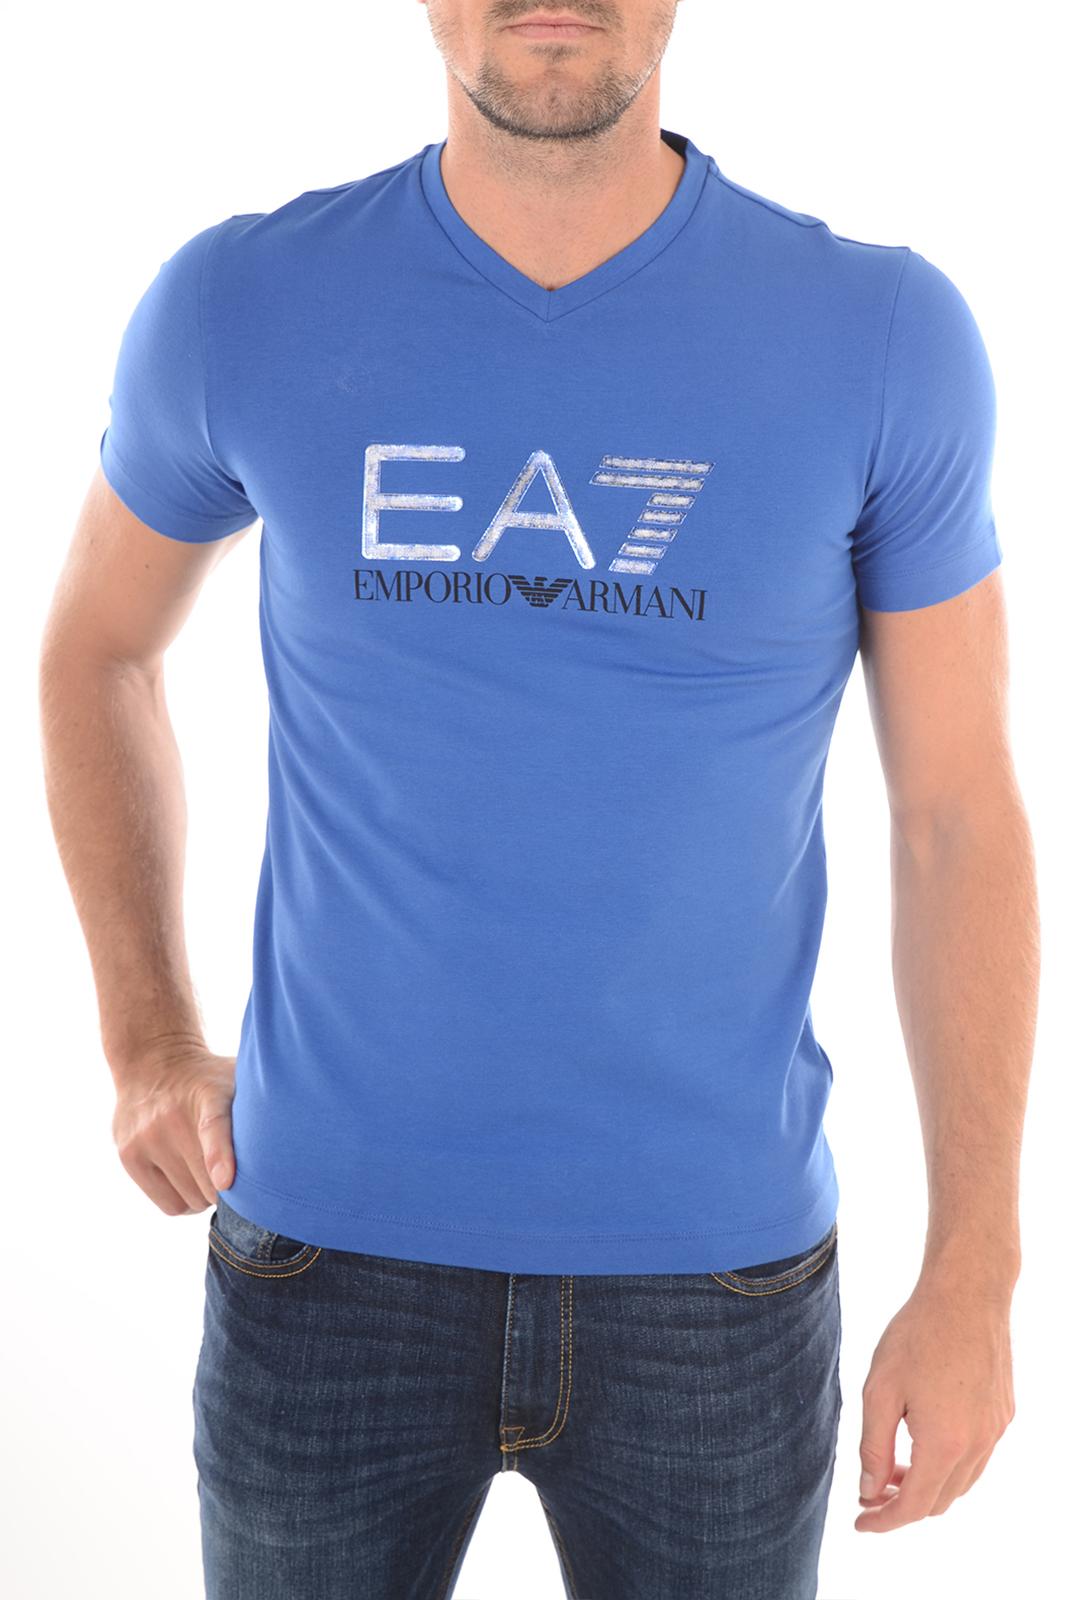 Tee-shirts  Emporio armani 273911 6P206 033 ROYAL